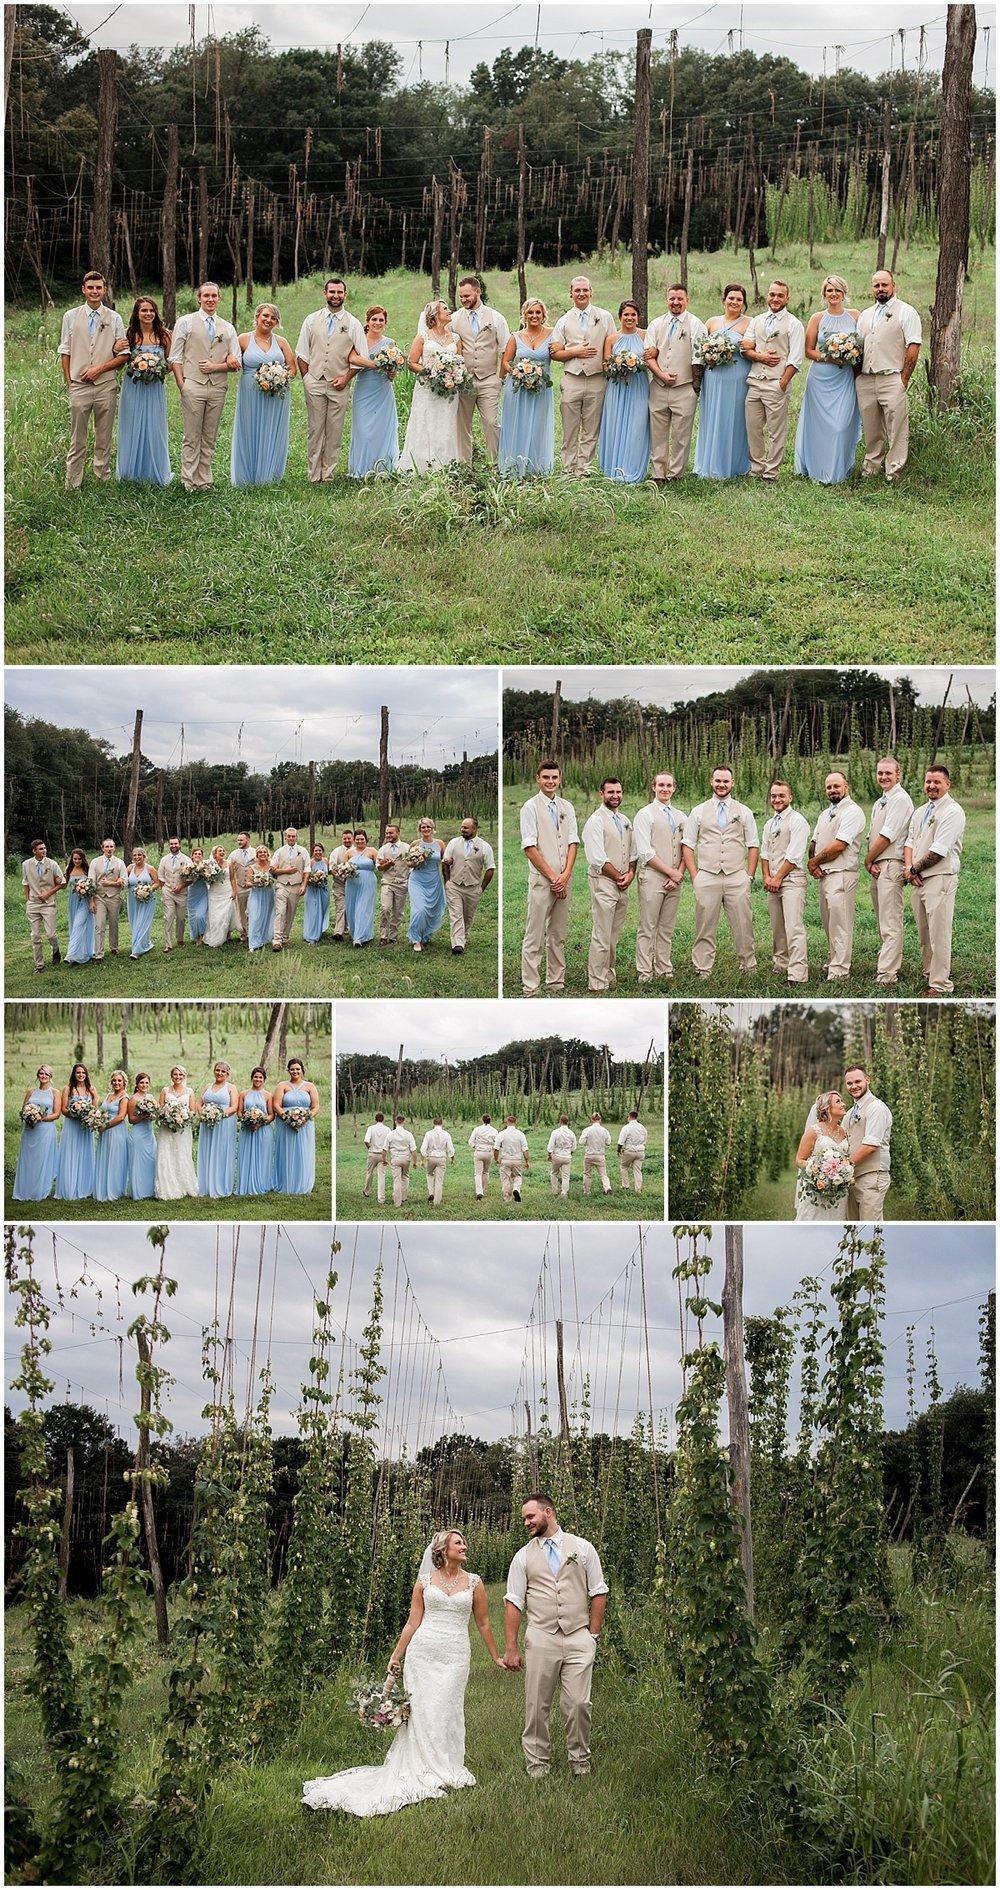 pittsburgh wedding photographer rustic natural wedding